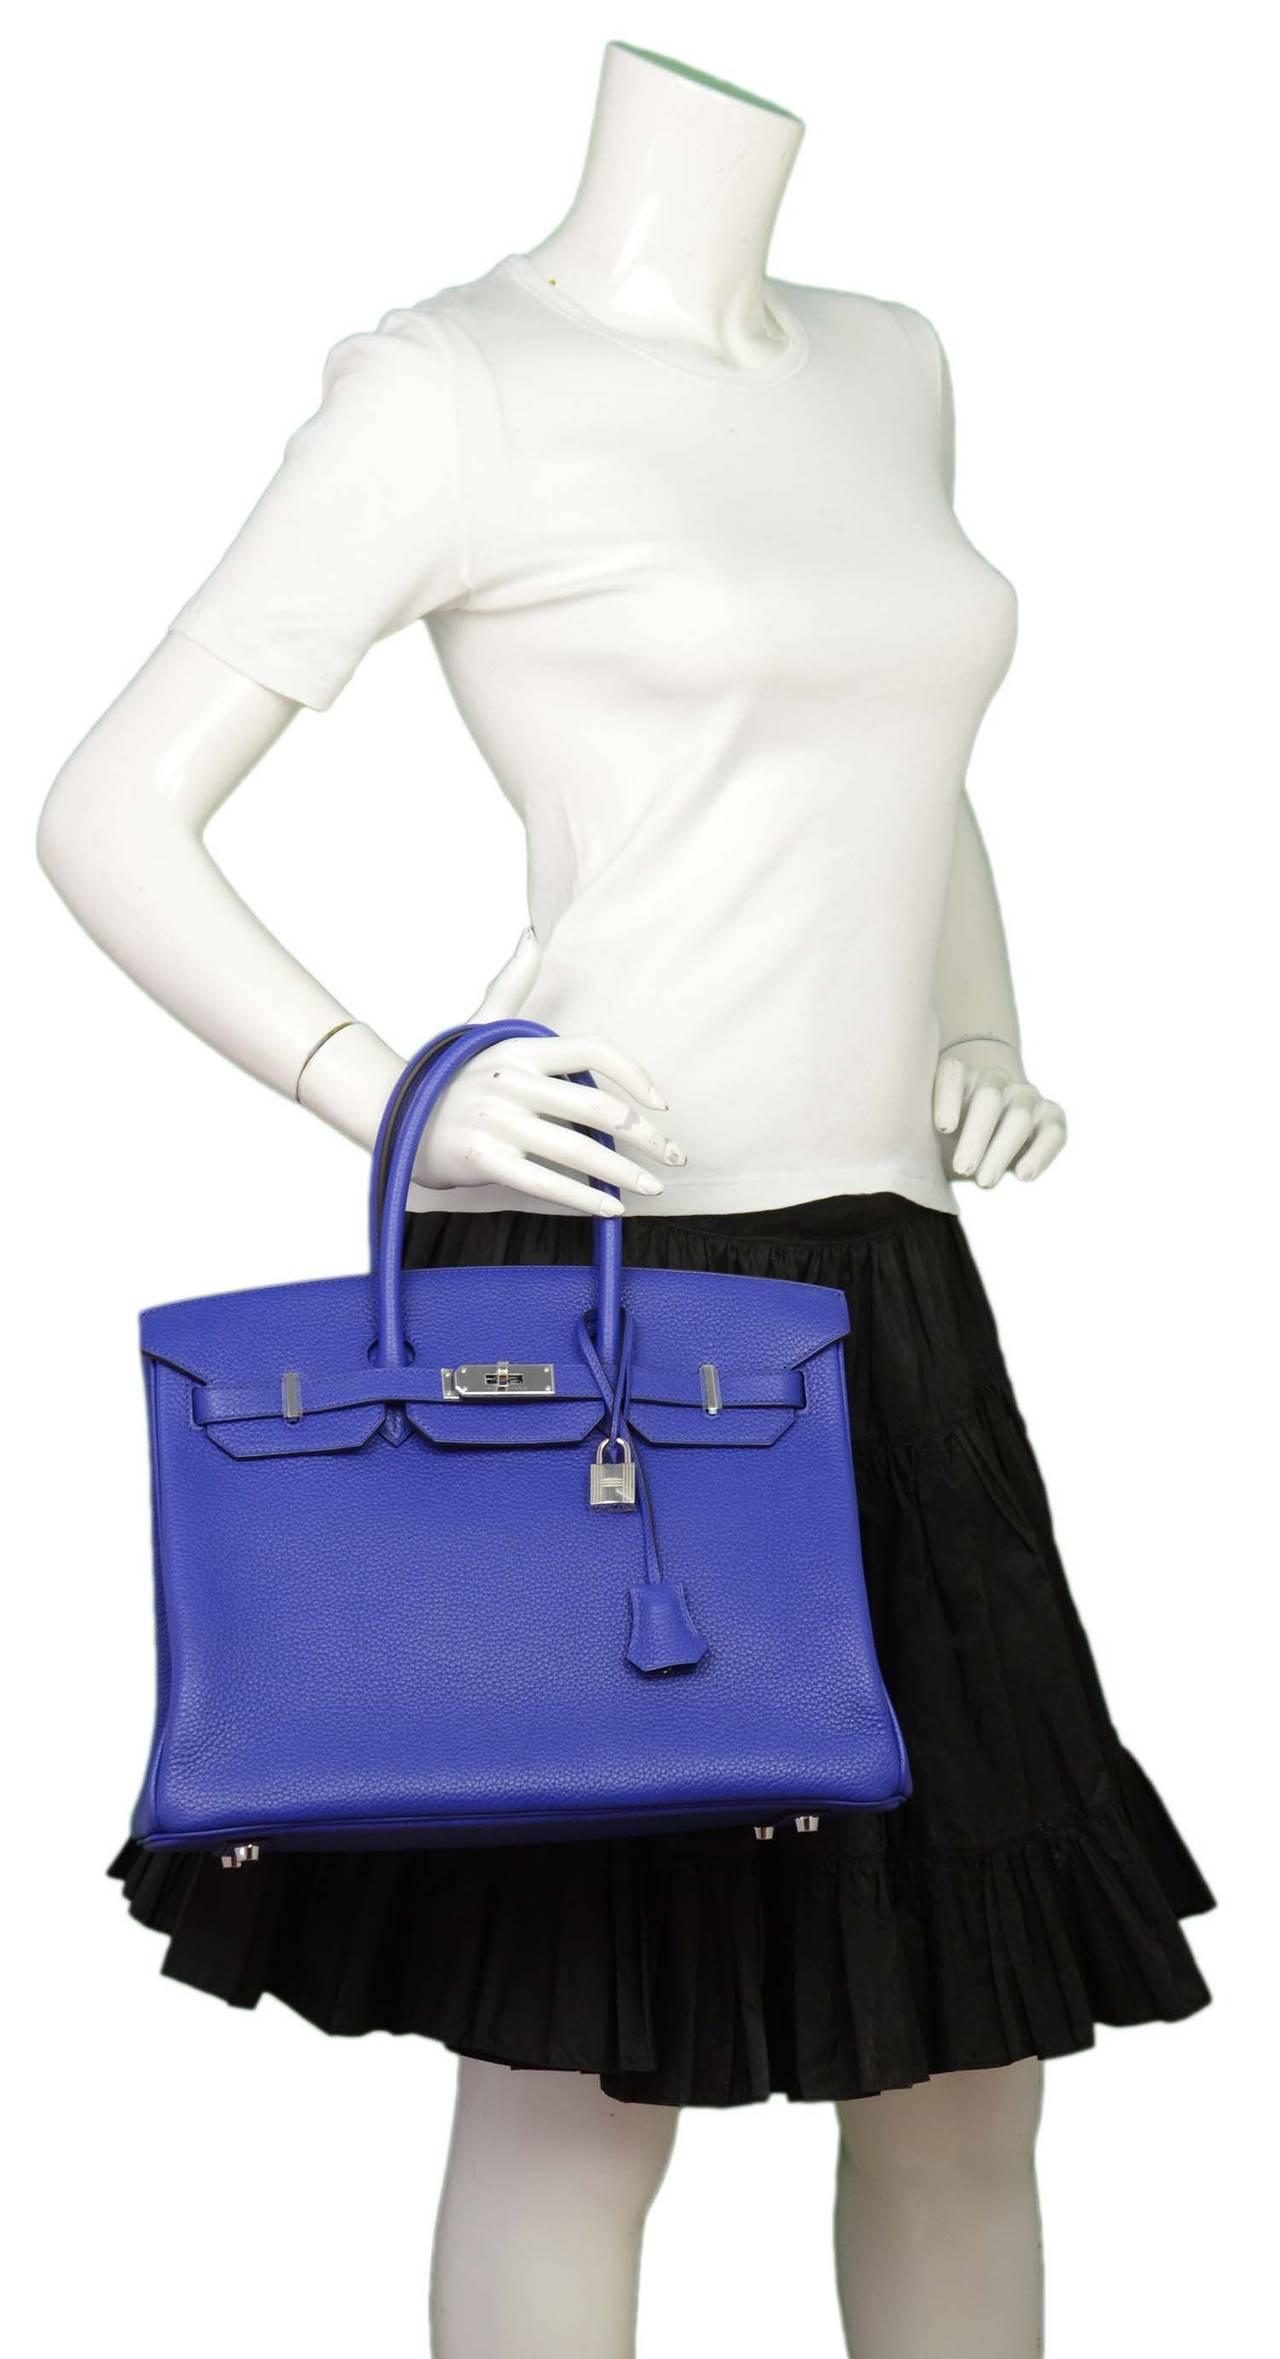 Hermes 30cm White Clemence Birkin Bag with Palladium Hardware and Fourbi Insert